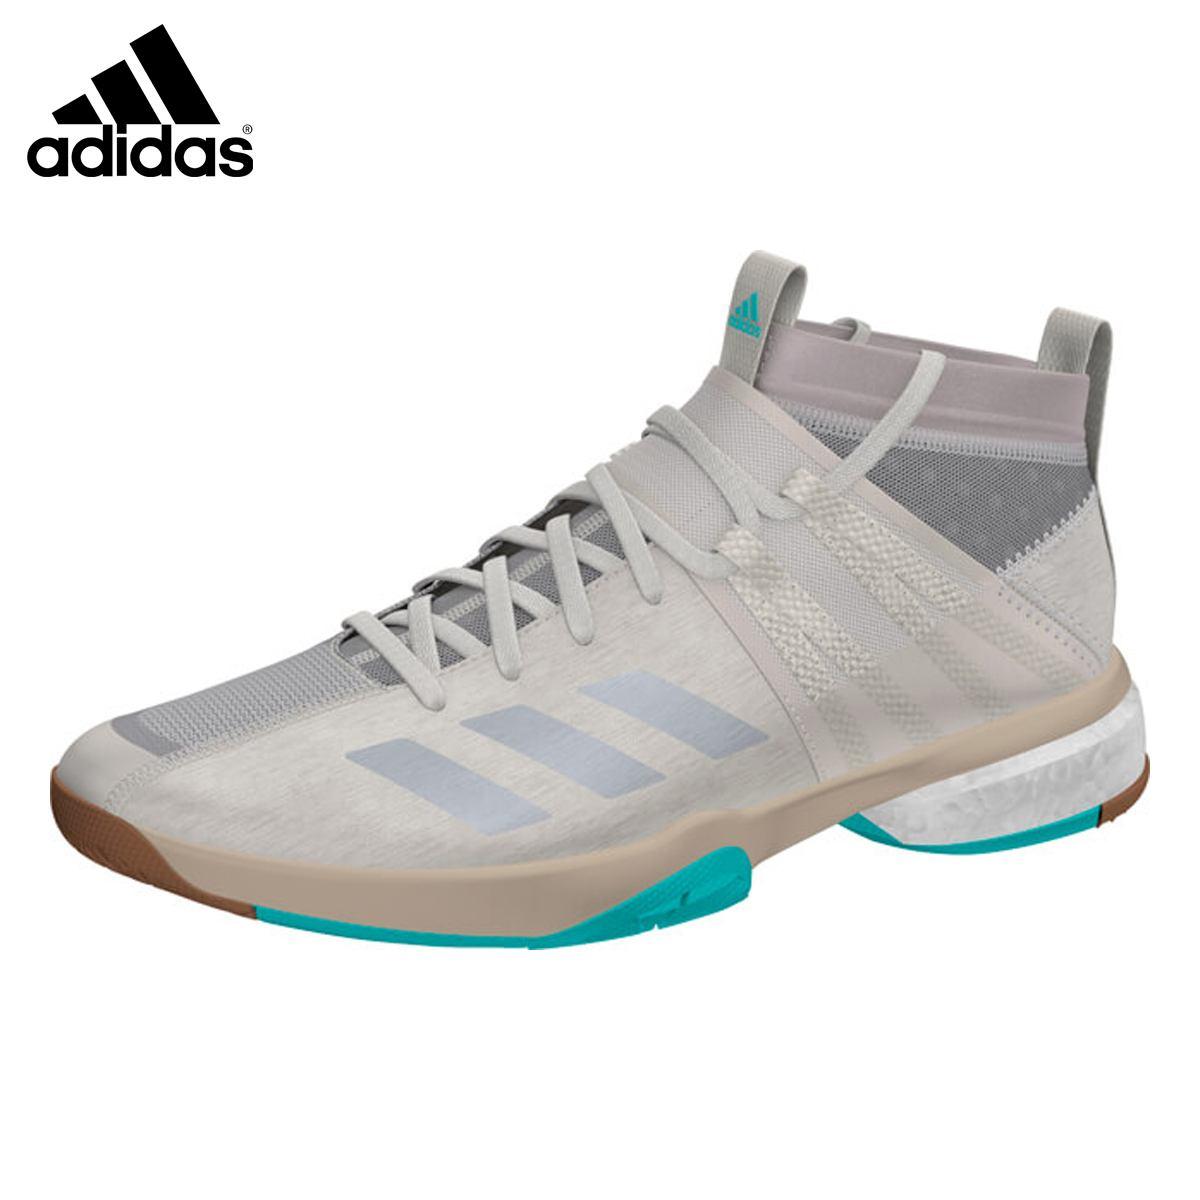 adidas DA8867 ヴフトP8.1 Boost搭載シューズ ブラウン バドミントンシューズ アディダス 2018FW【日本バドミントン協会審査合格品/ 取り寄せ】